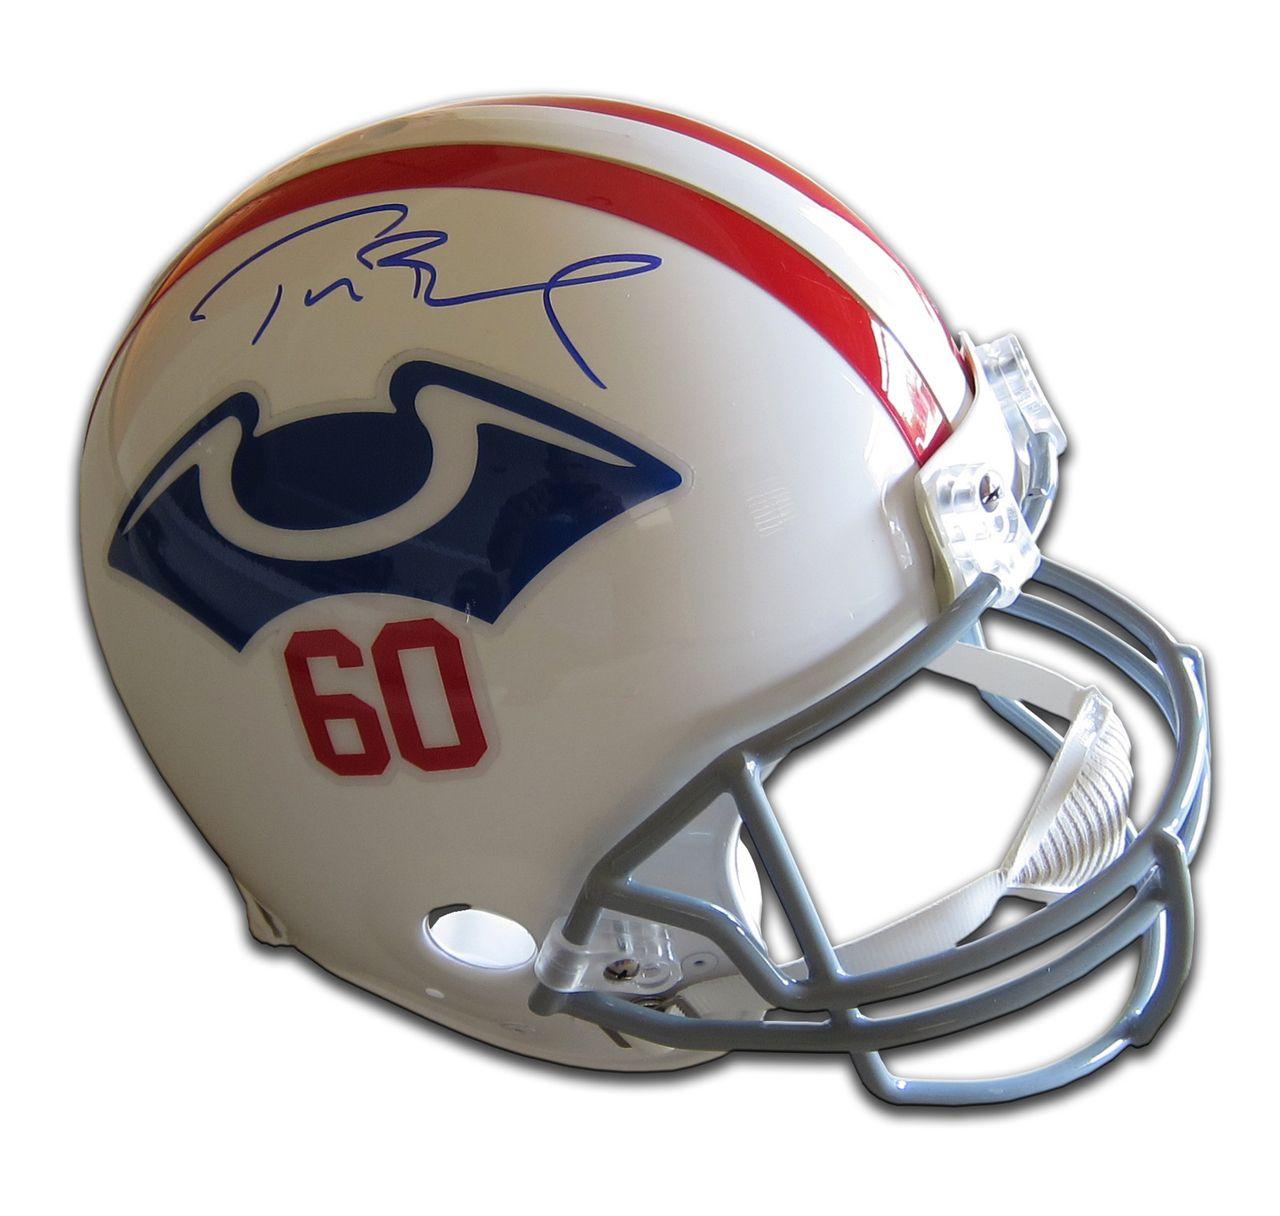 buy popular 6c18f db24c TOM BRADY Signed Authentic Patriots Proline Throwback Helmet ...